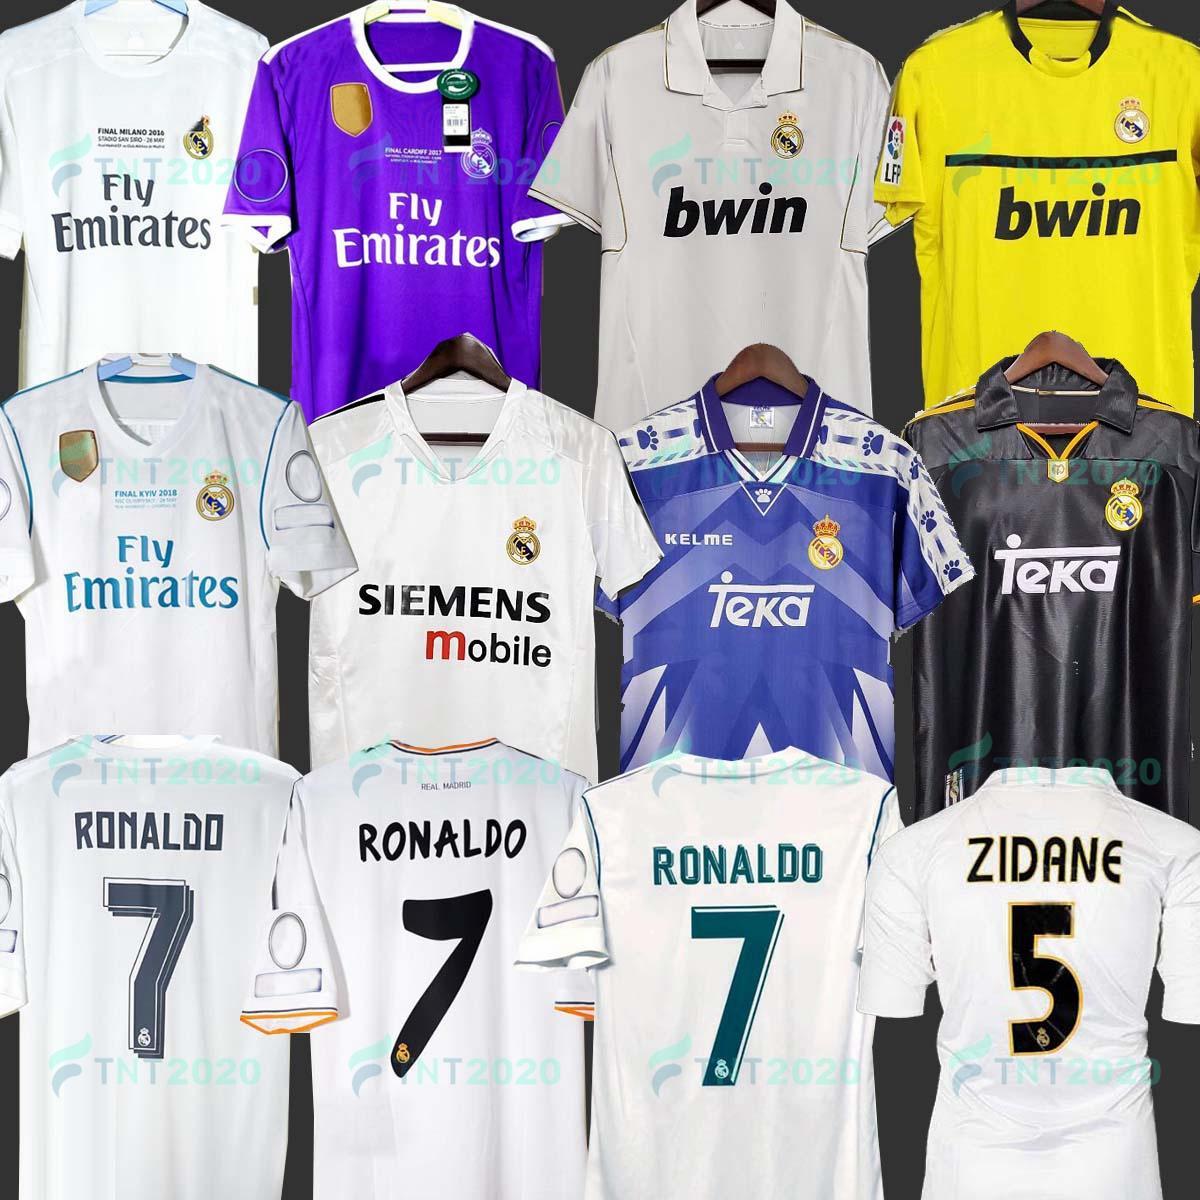 07 08 Sergio Ramos Asensio Ronaldo Retro 2013 2014 Soccer Jersey Benzema 15 16 النهائي Home 17 18 النهائي Camiseta de Fútbol